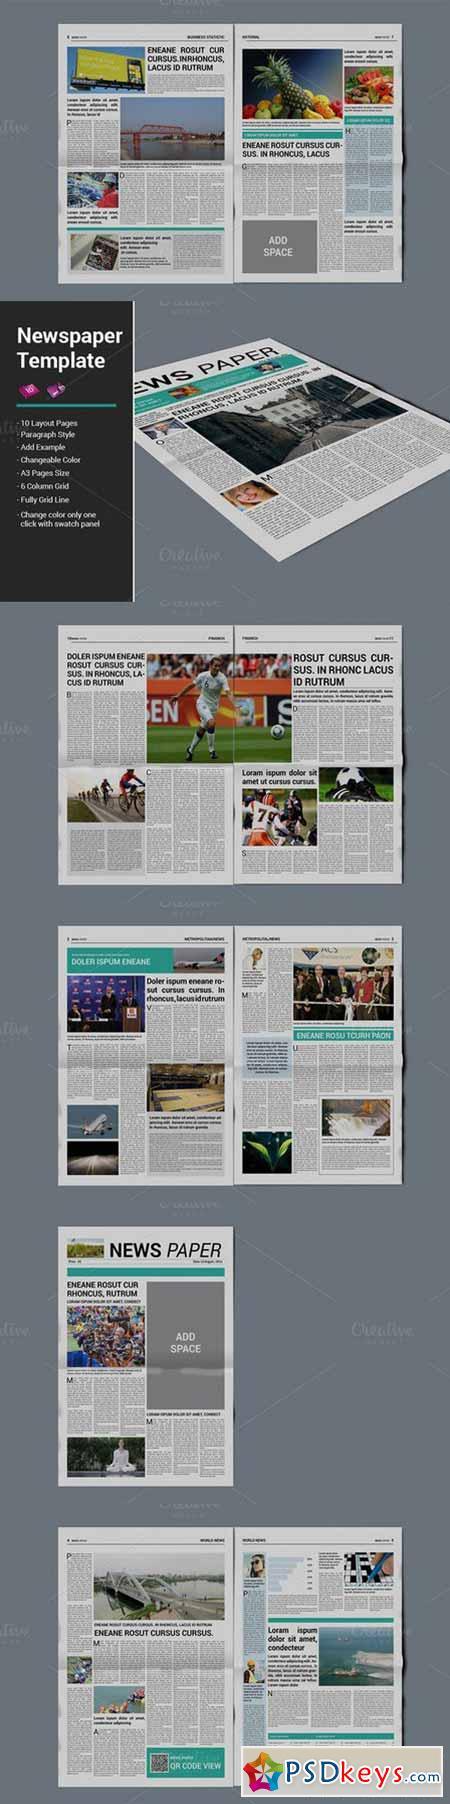 Newspaper Template 471074